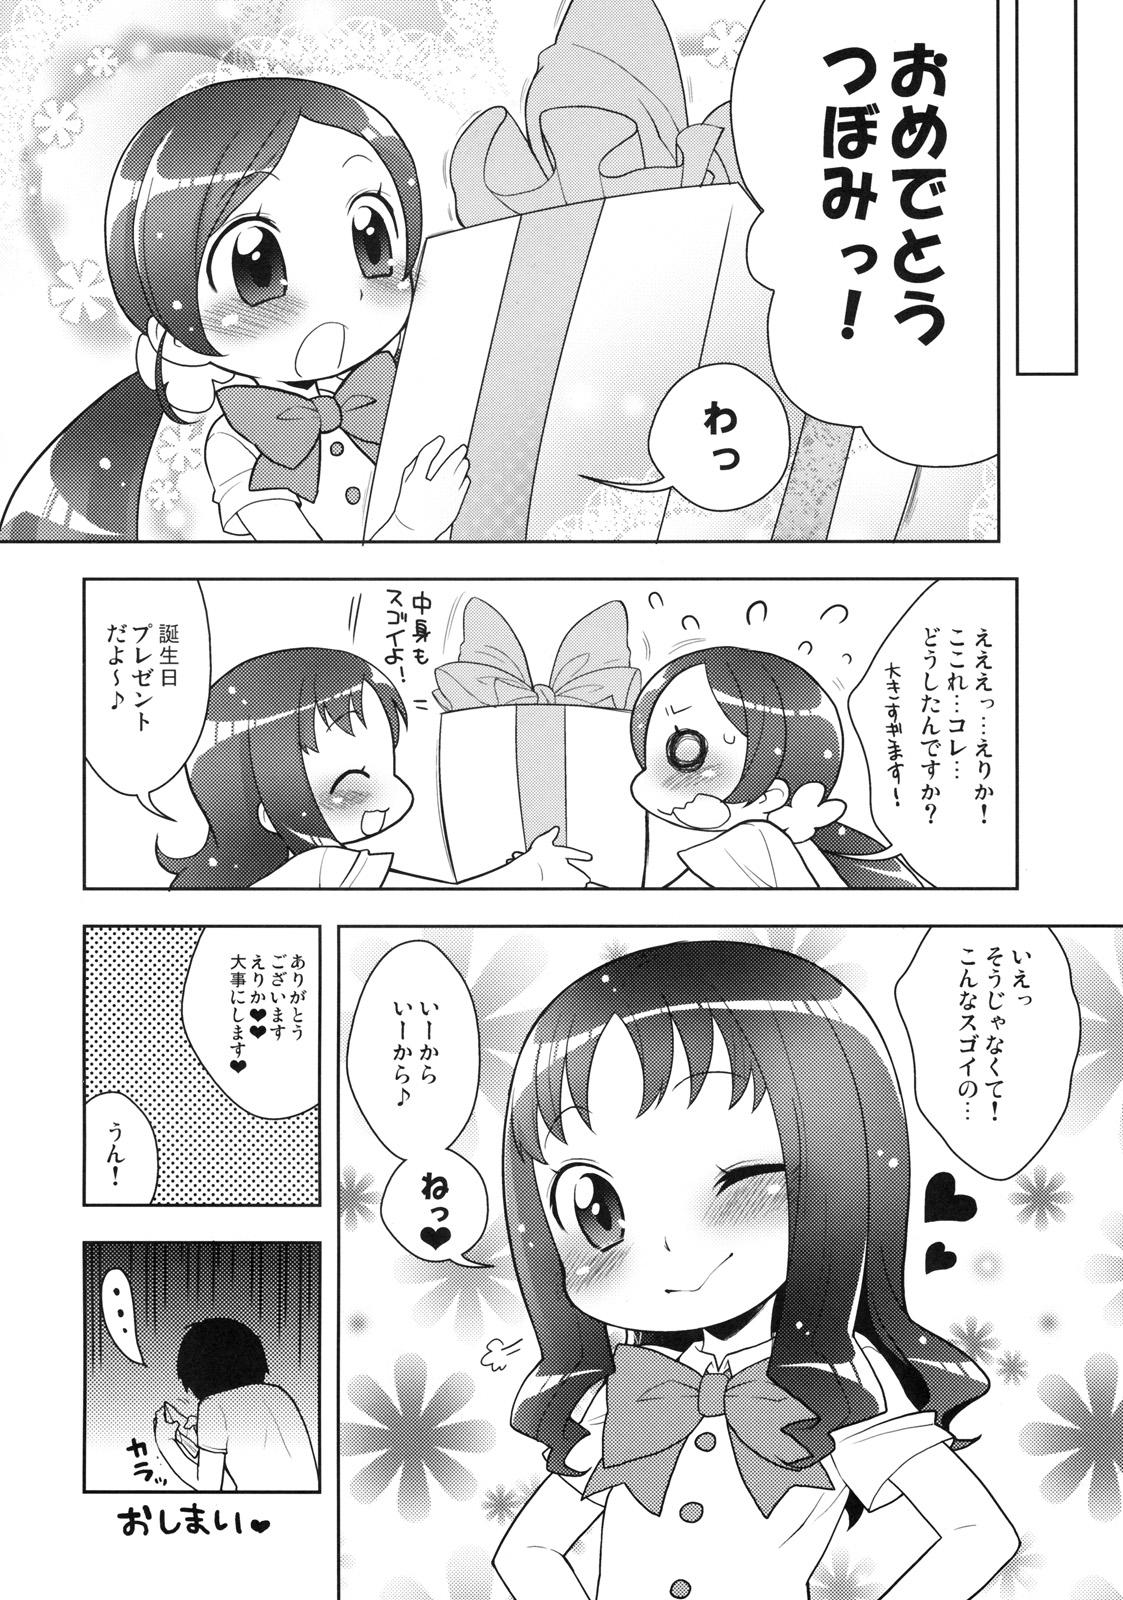 Erika to Nakayoshi Ecchi 18